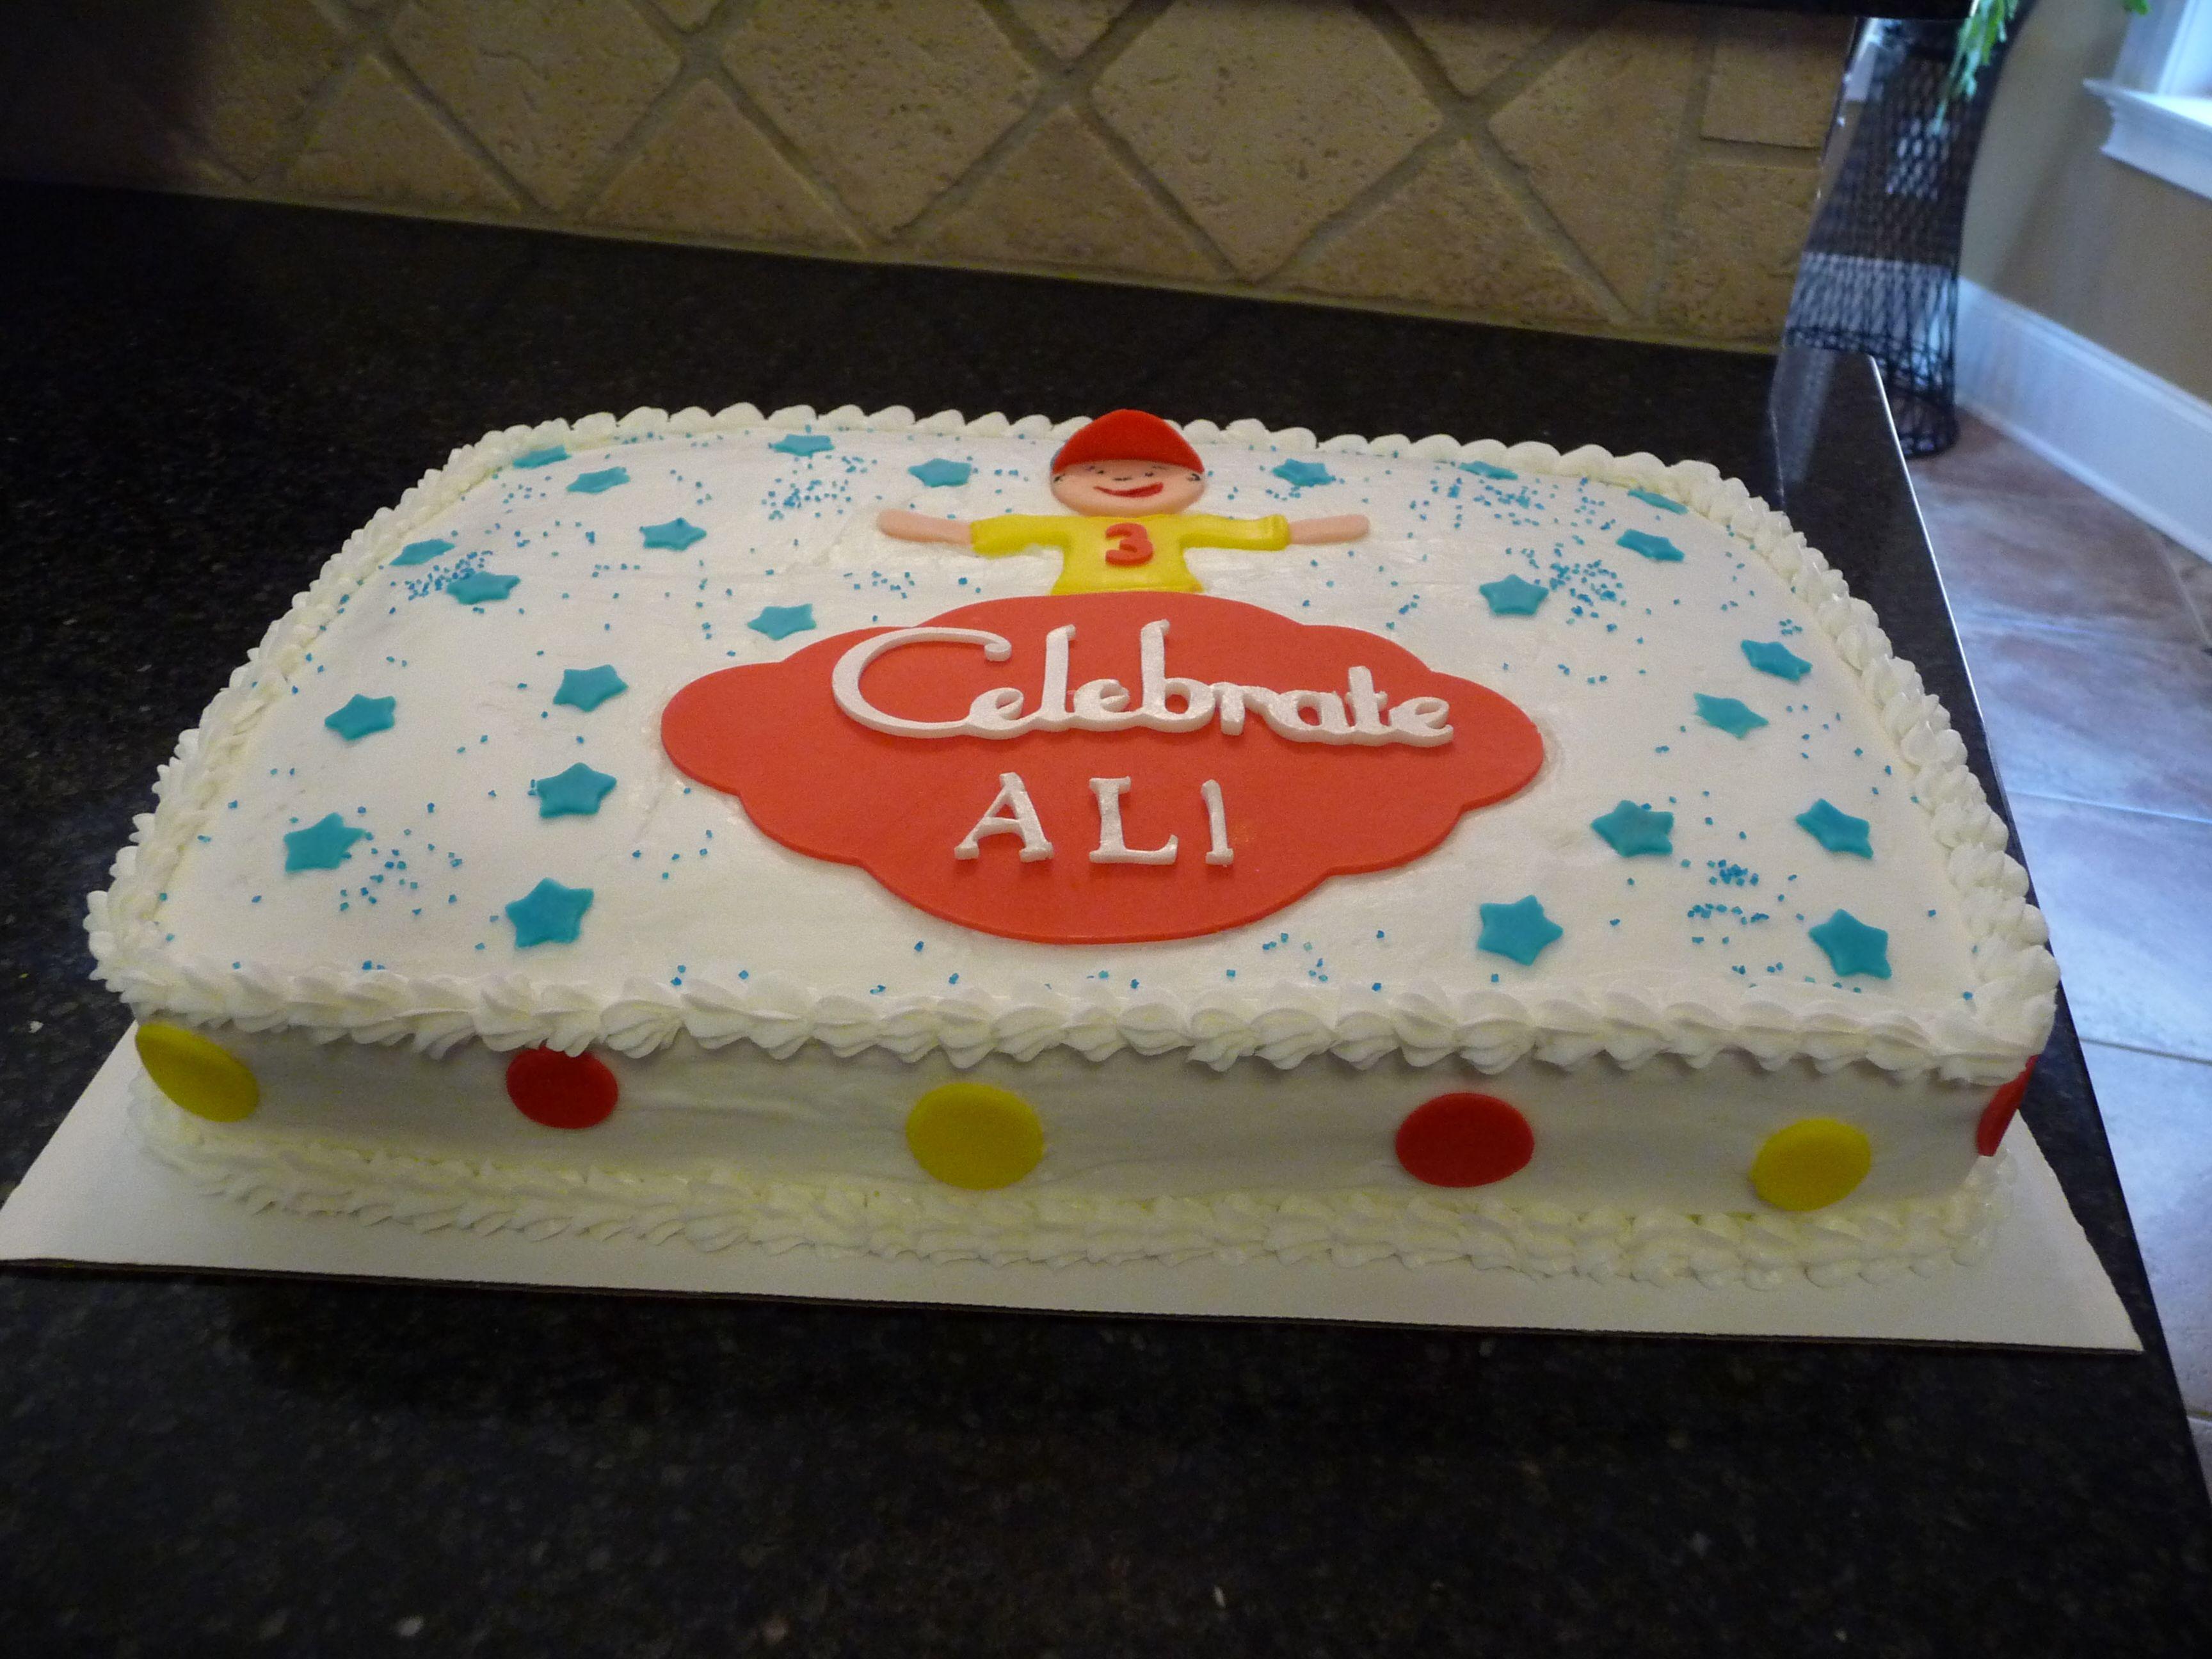 Happy Birthday Ali Memories With Cake Cake Birthday Happy Birthday